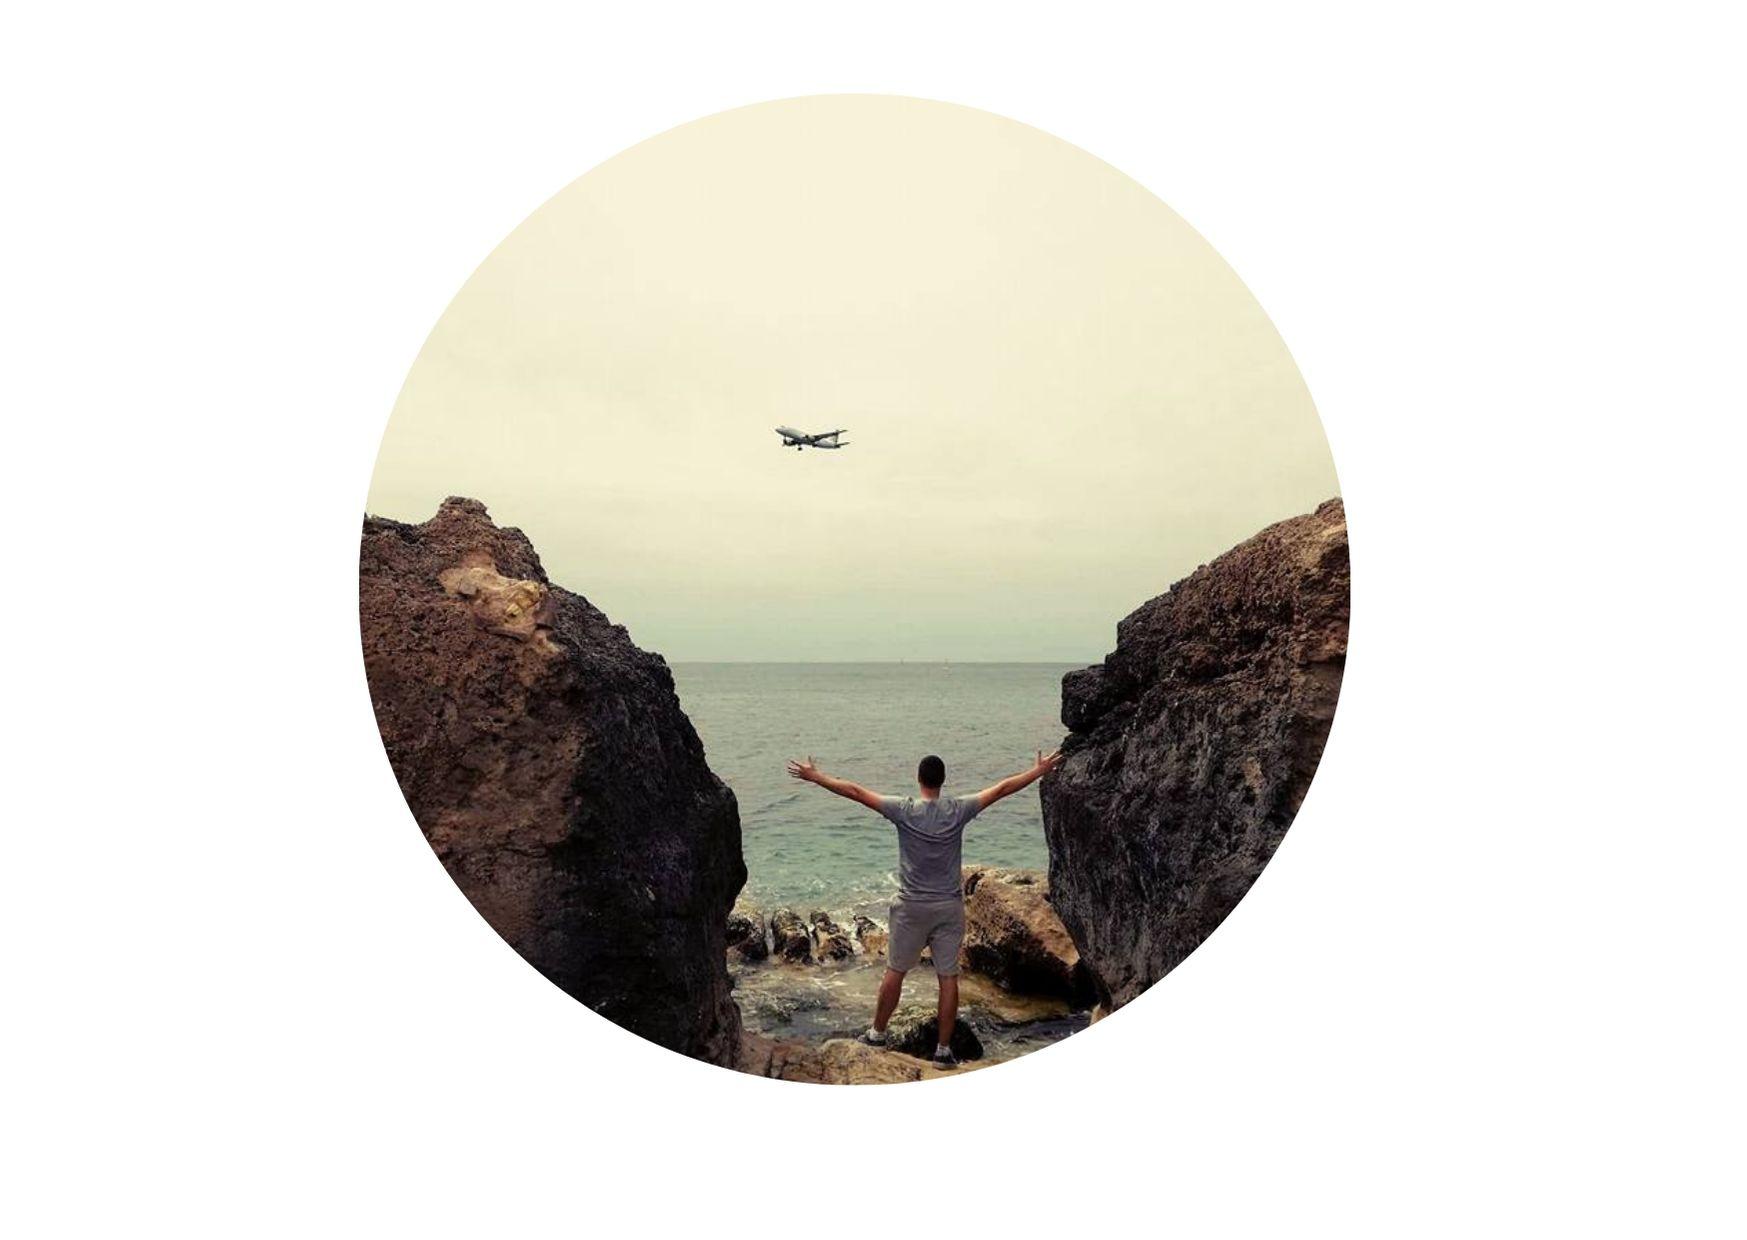 roman šlosár travel expert tui profilová fotka